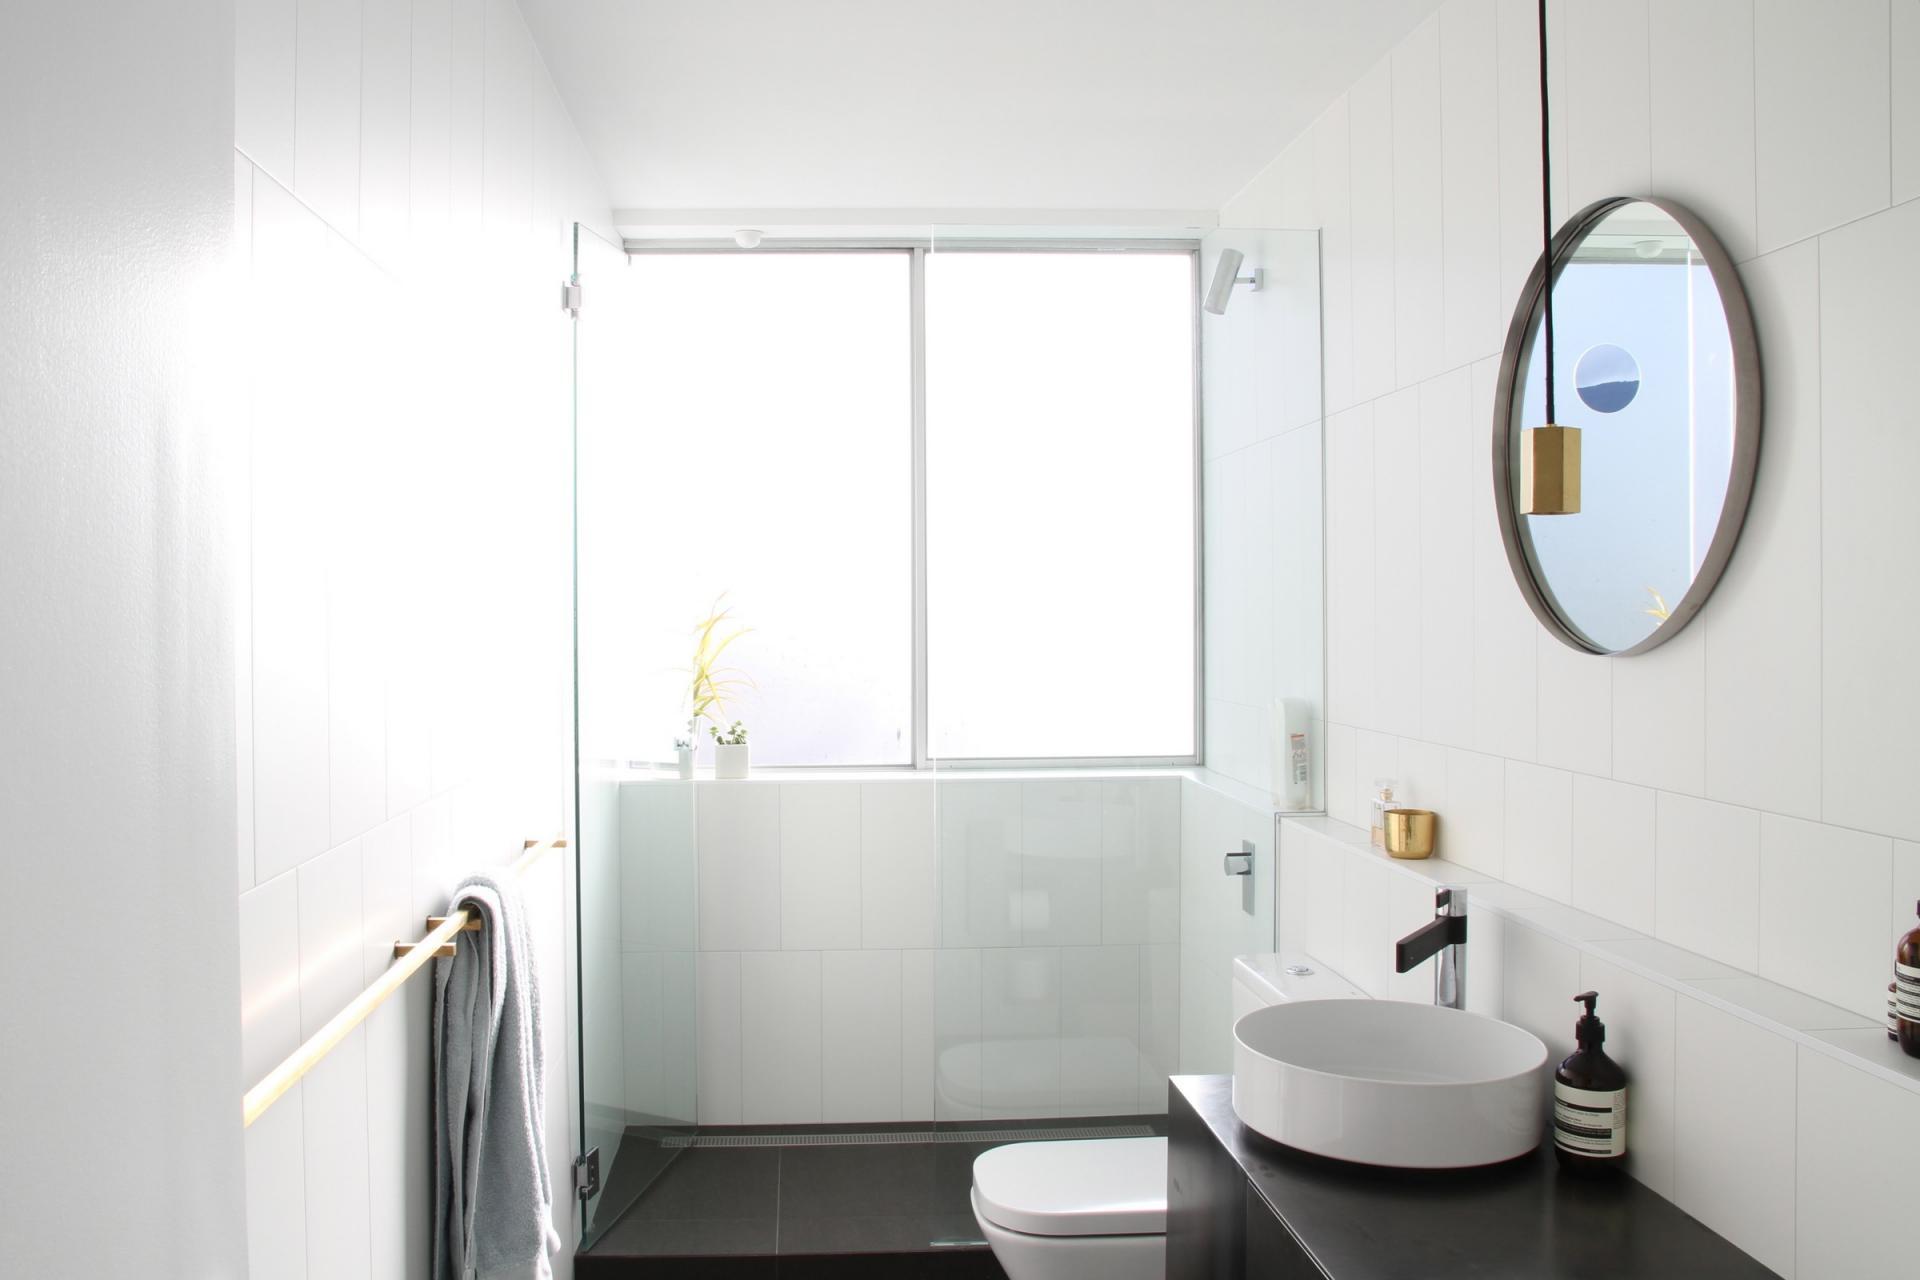 S rad banyo dekorasyon modelleri deal kabin - Banyo dekorasyon ...